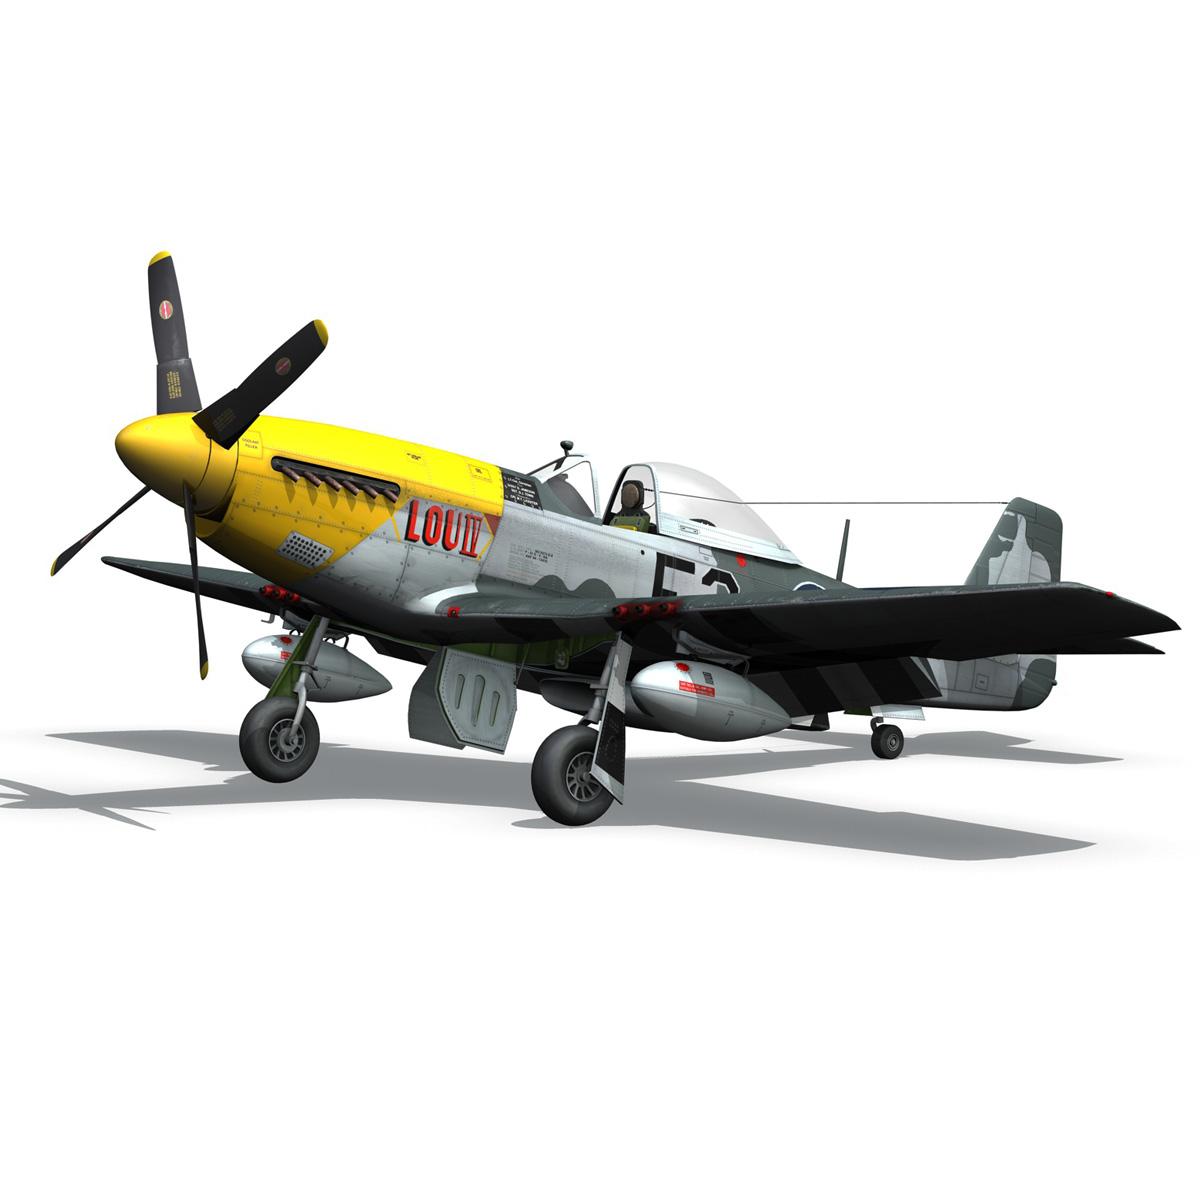 north american p-51d mustang – lou iv 3d model fbx c4d lwo obj 272608